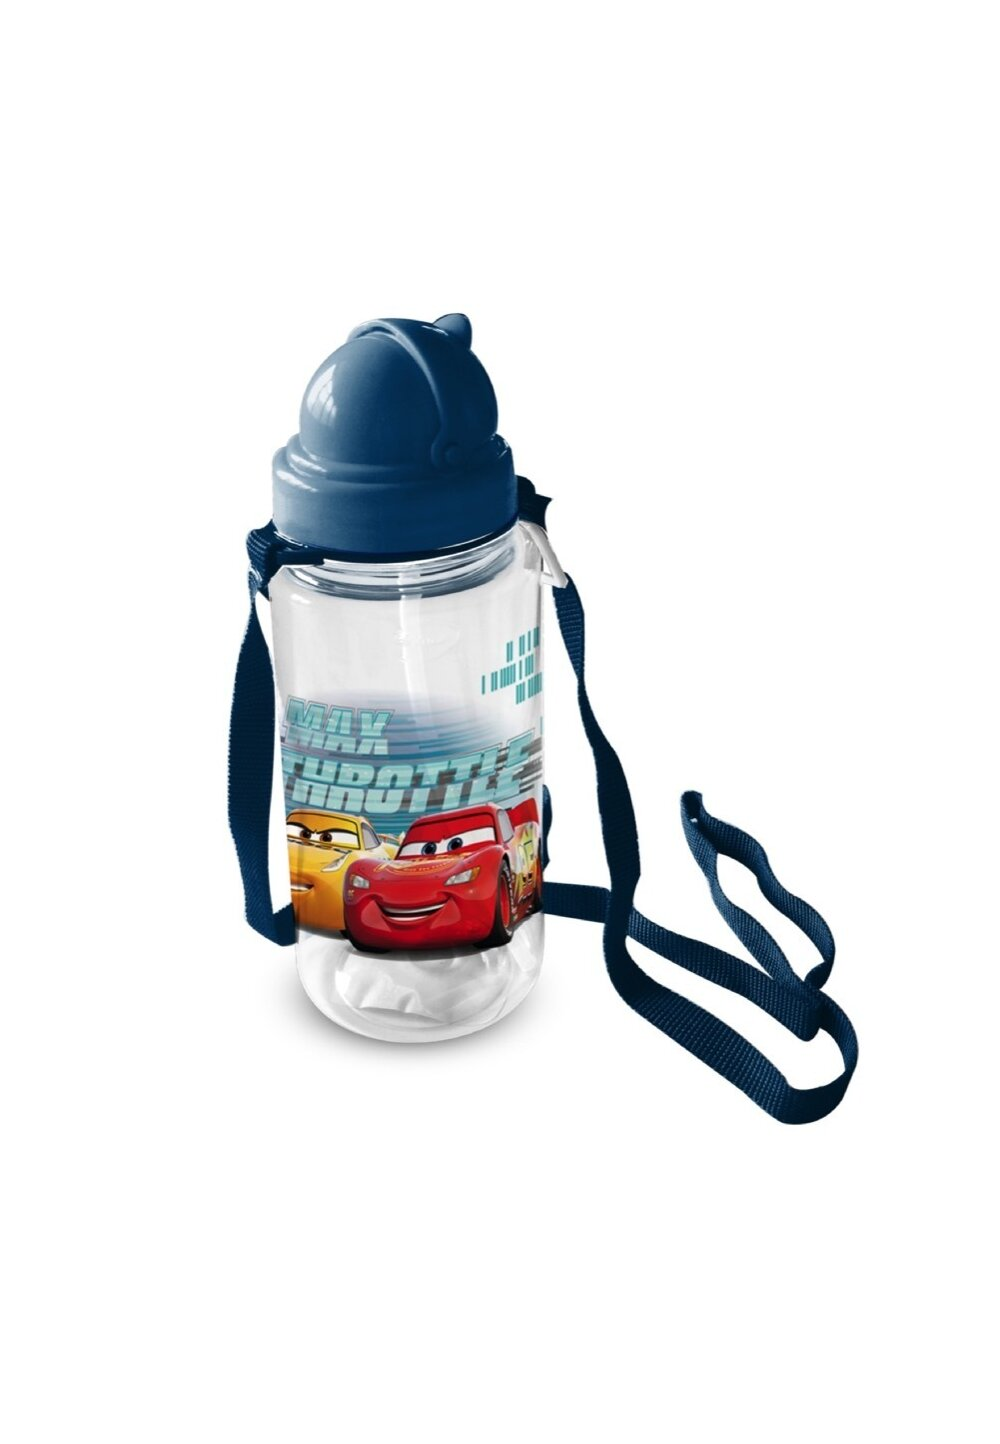 Sticla cu pai, Cars, bluemarin imagine